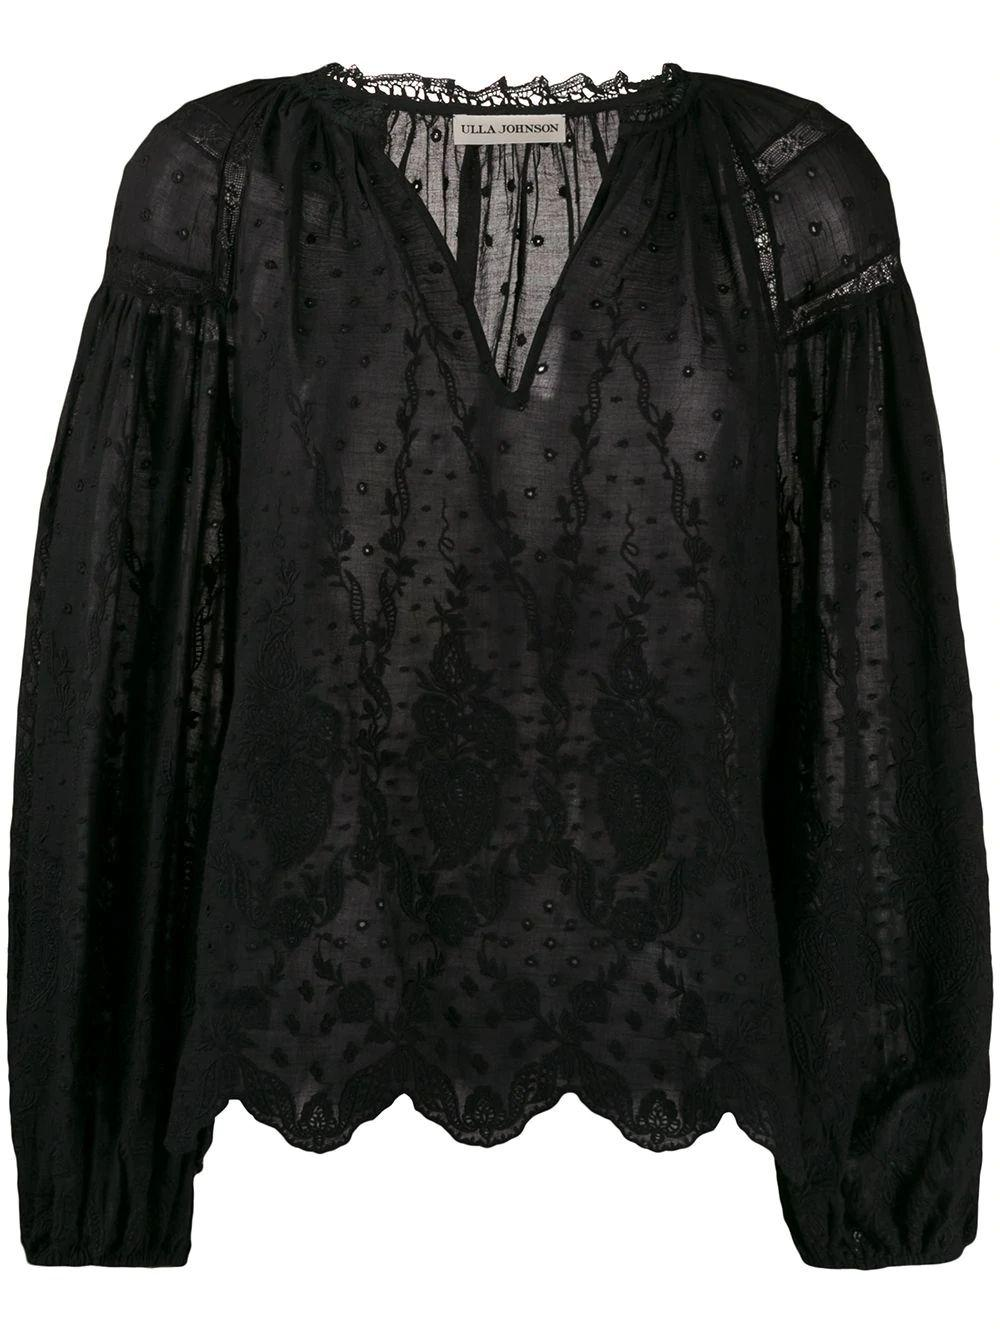 Harper Victorian Embroidered Long Sleeved Top Item # HO190210